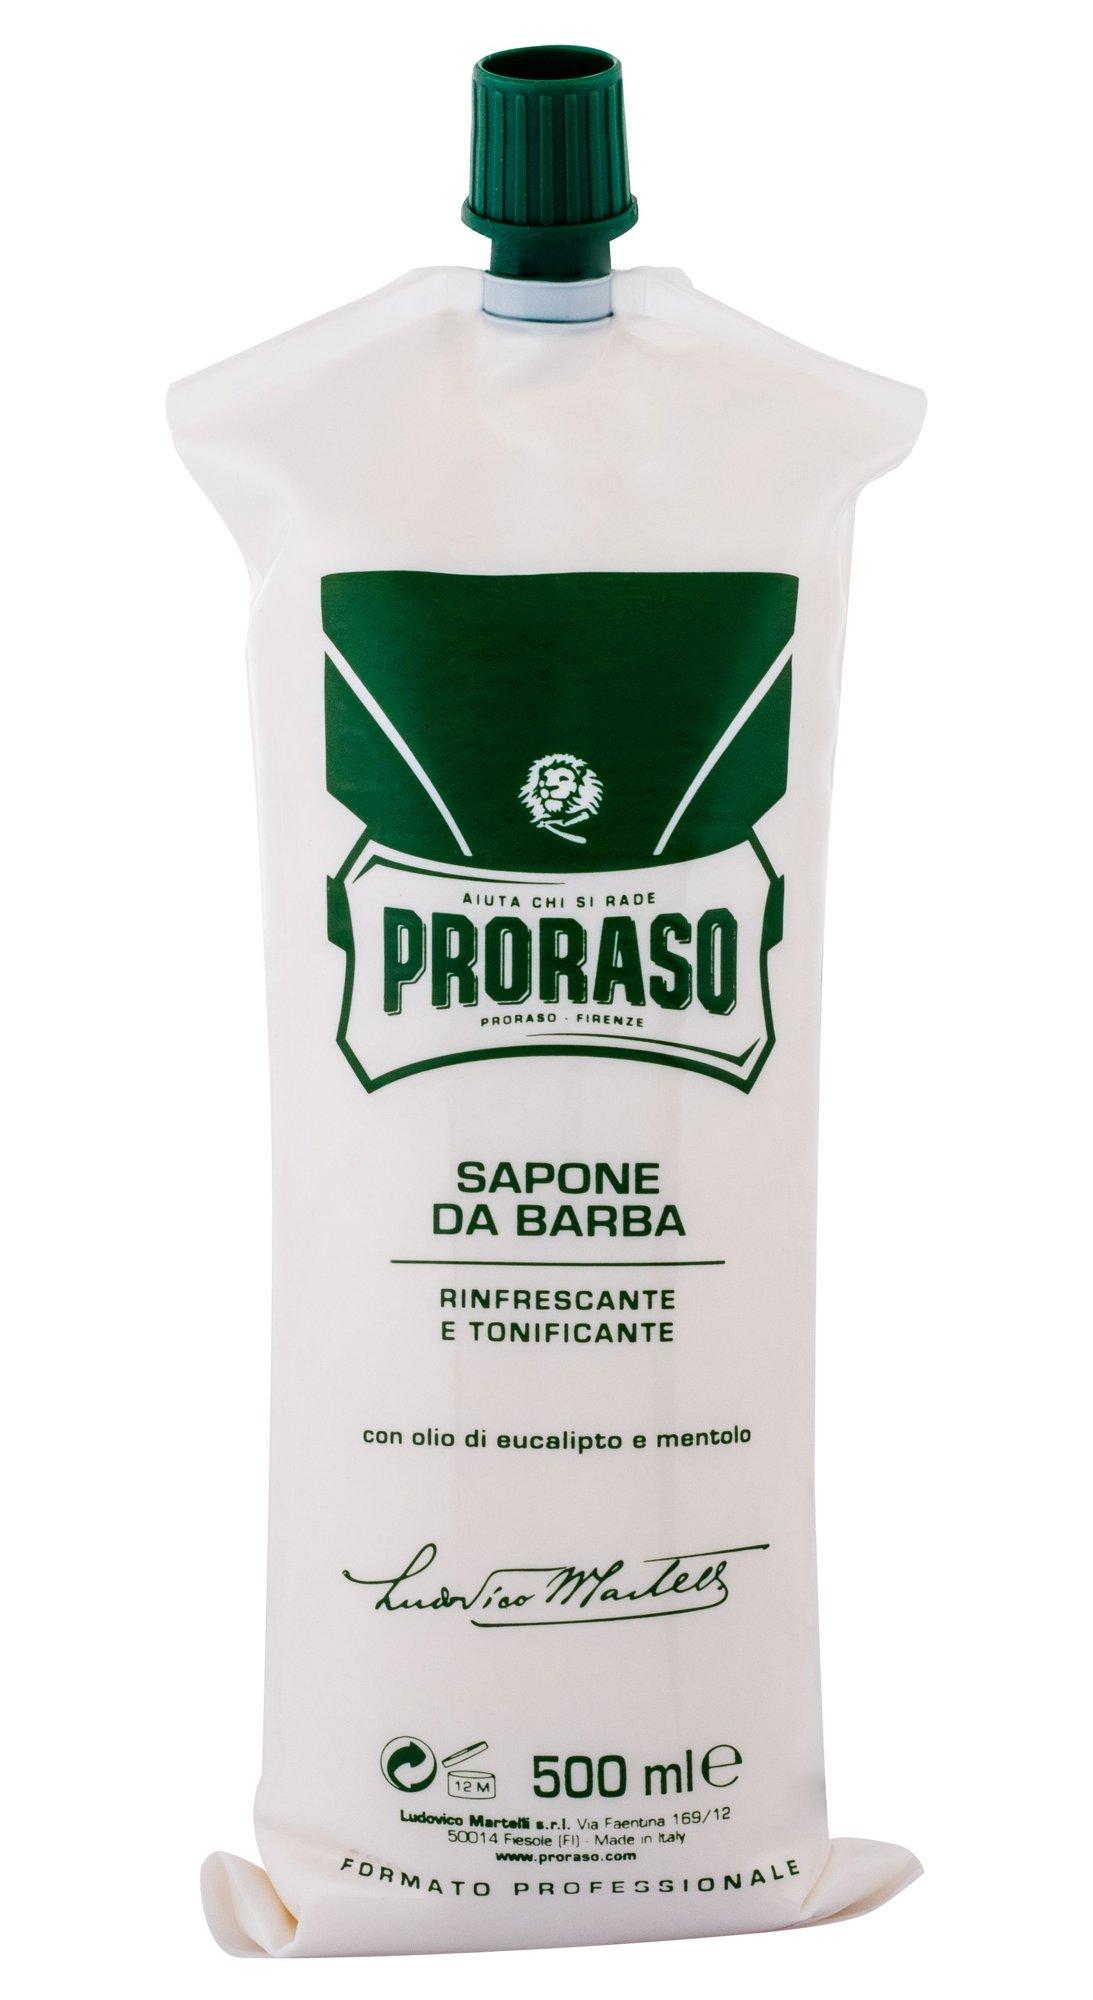 PRORASO Green Shaving Cream 500ml